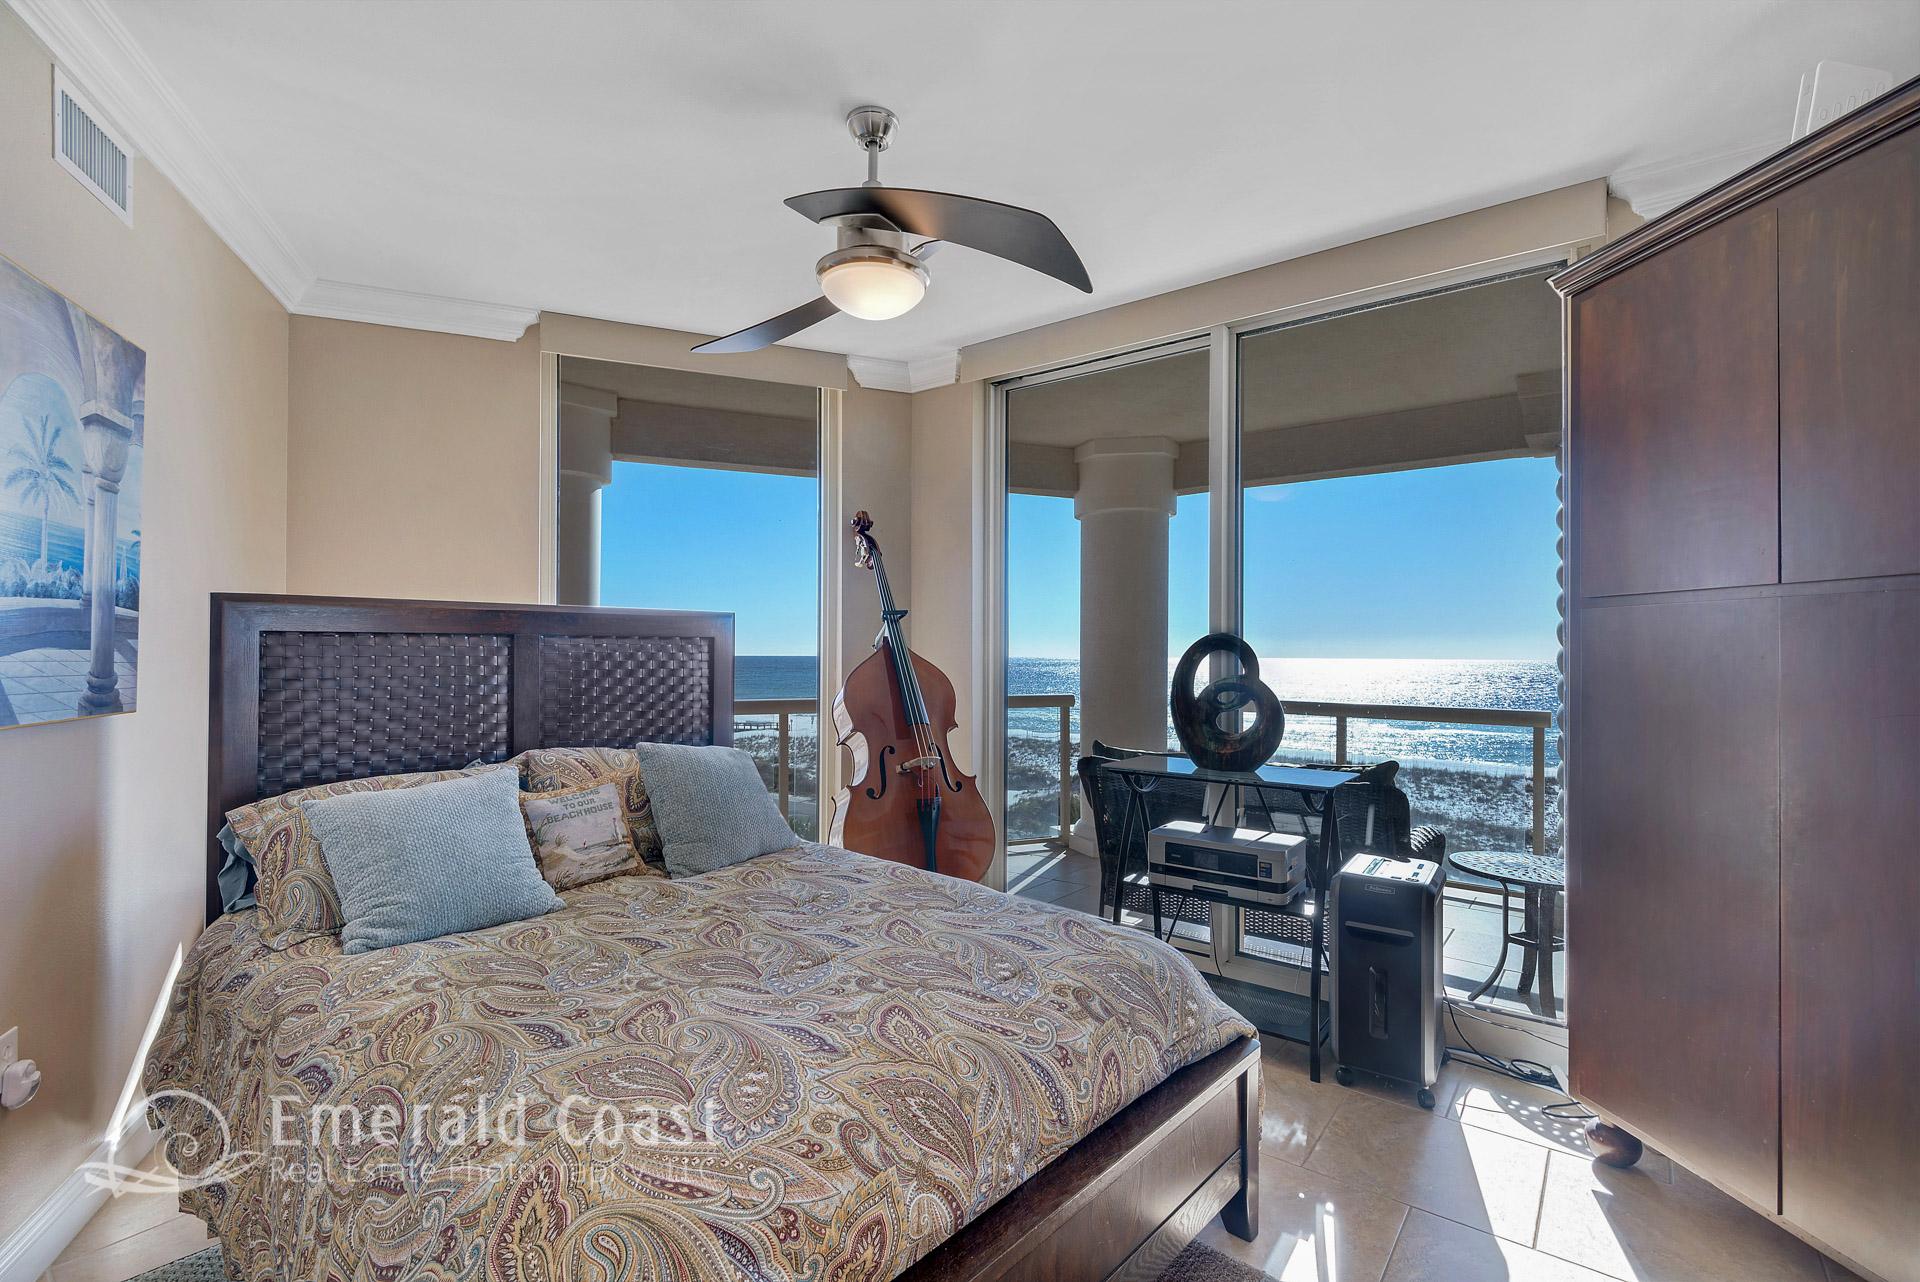 Luxury Bedroom In Portofino Island Resort